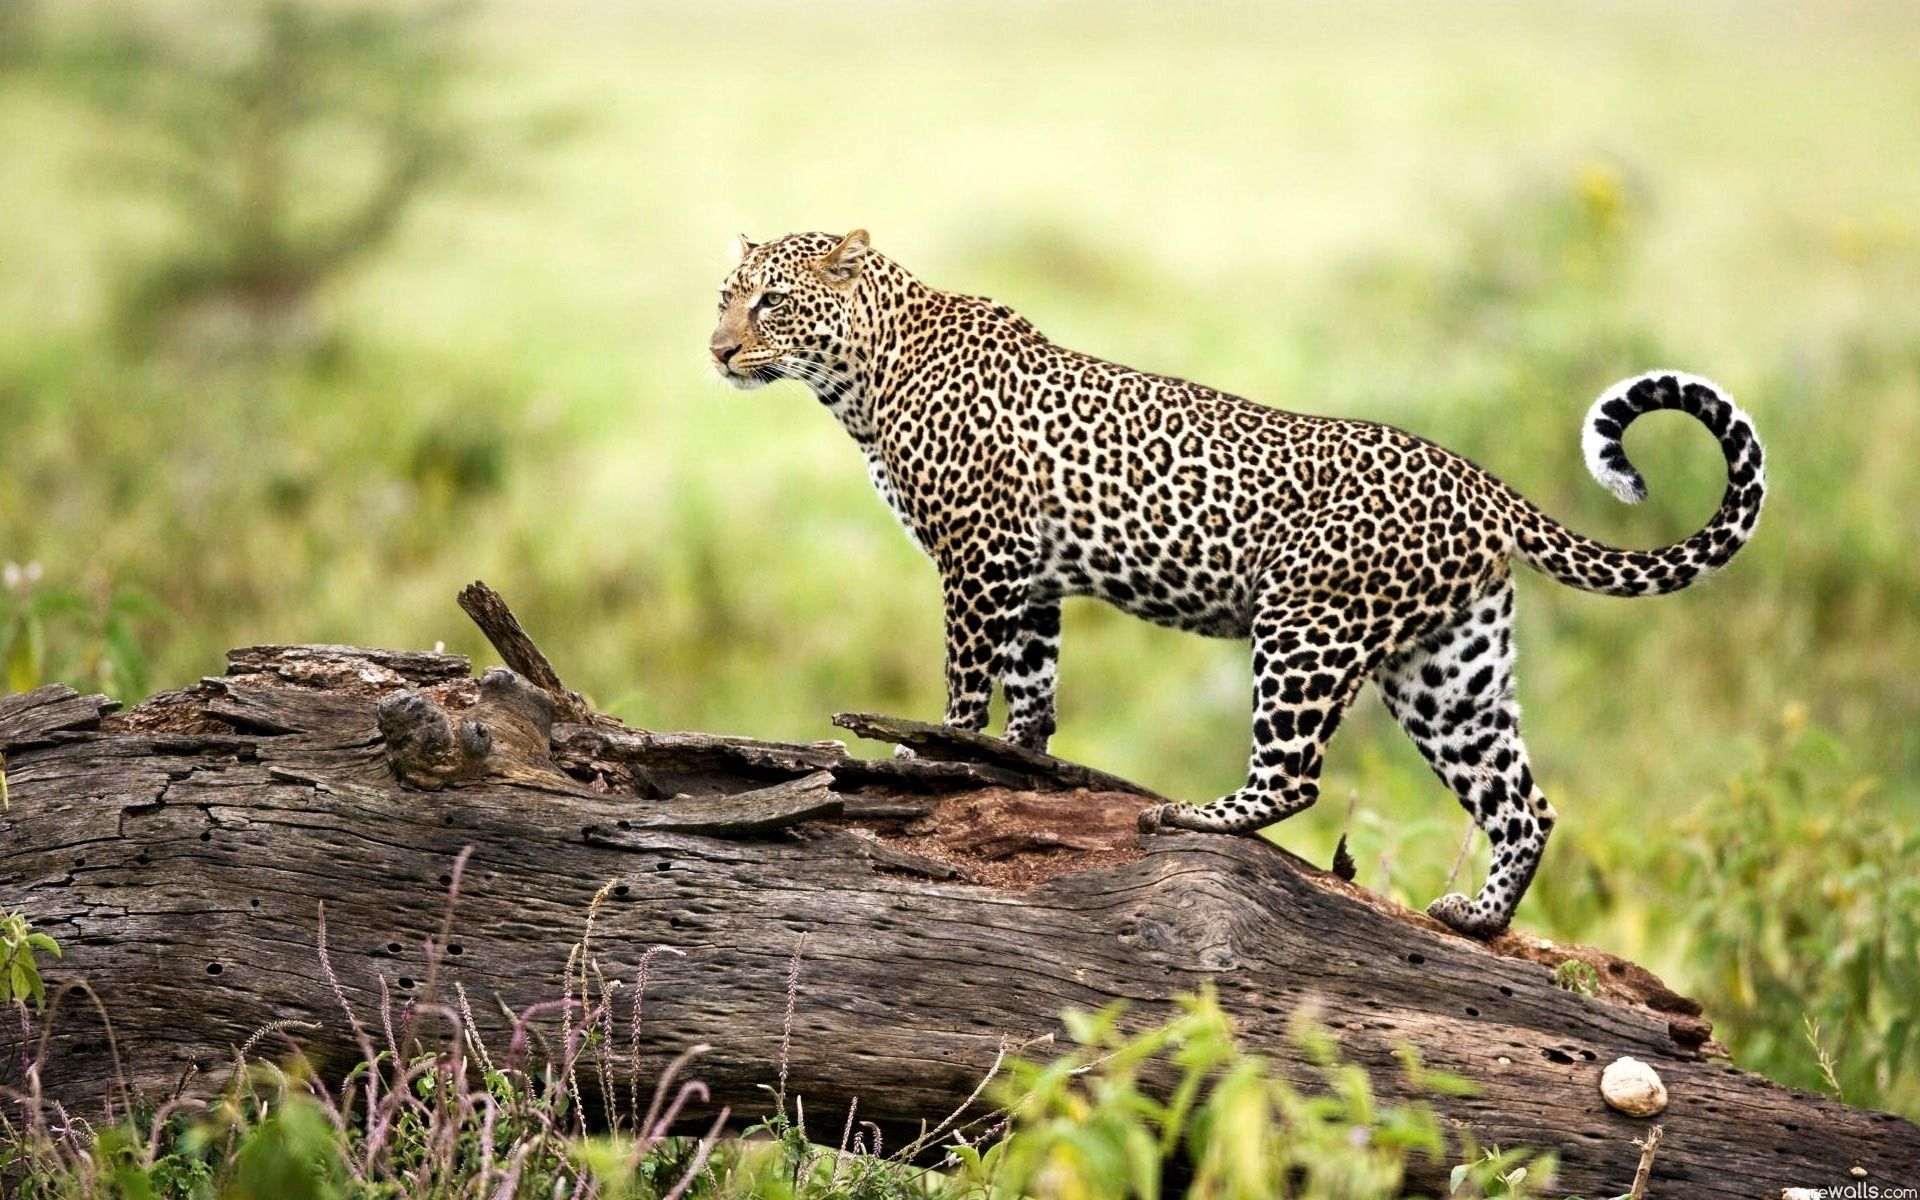 200 best photography images on Pinterest | Wildlife photography ...